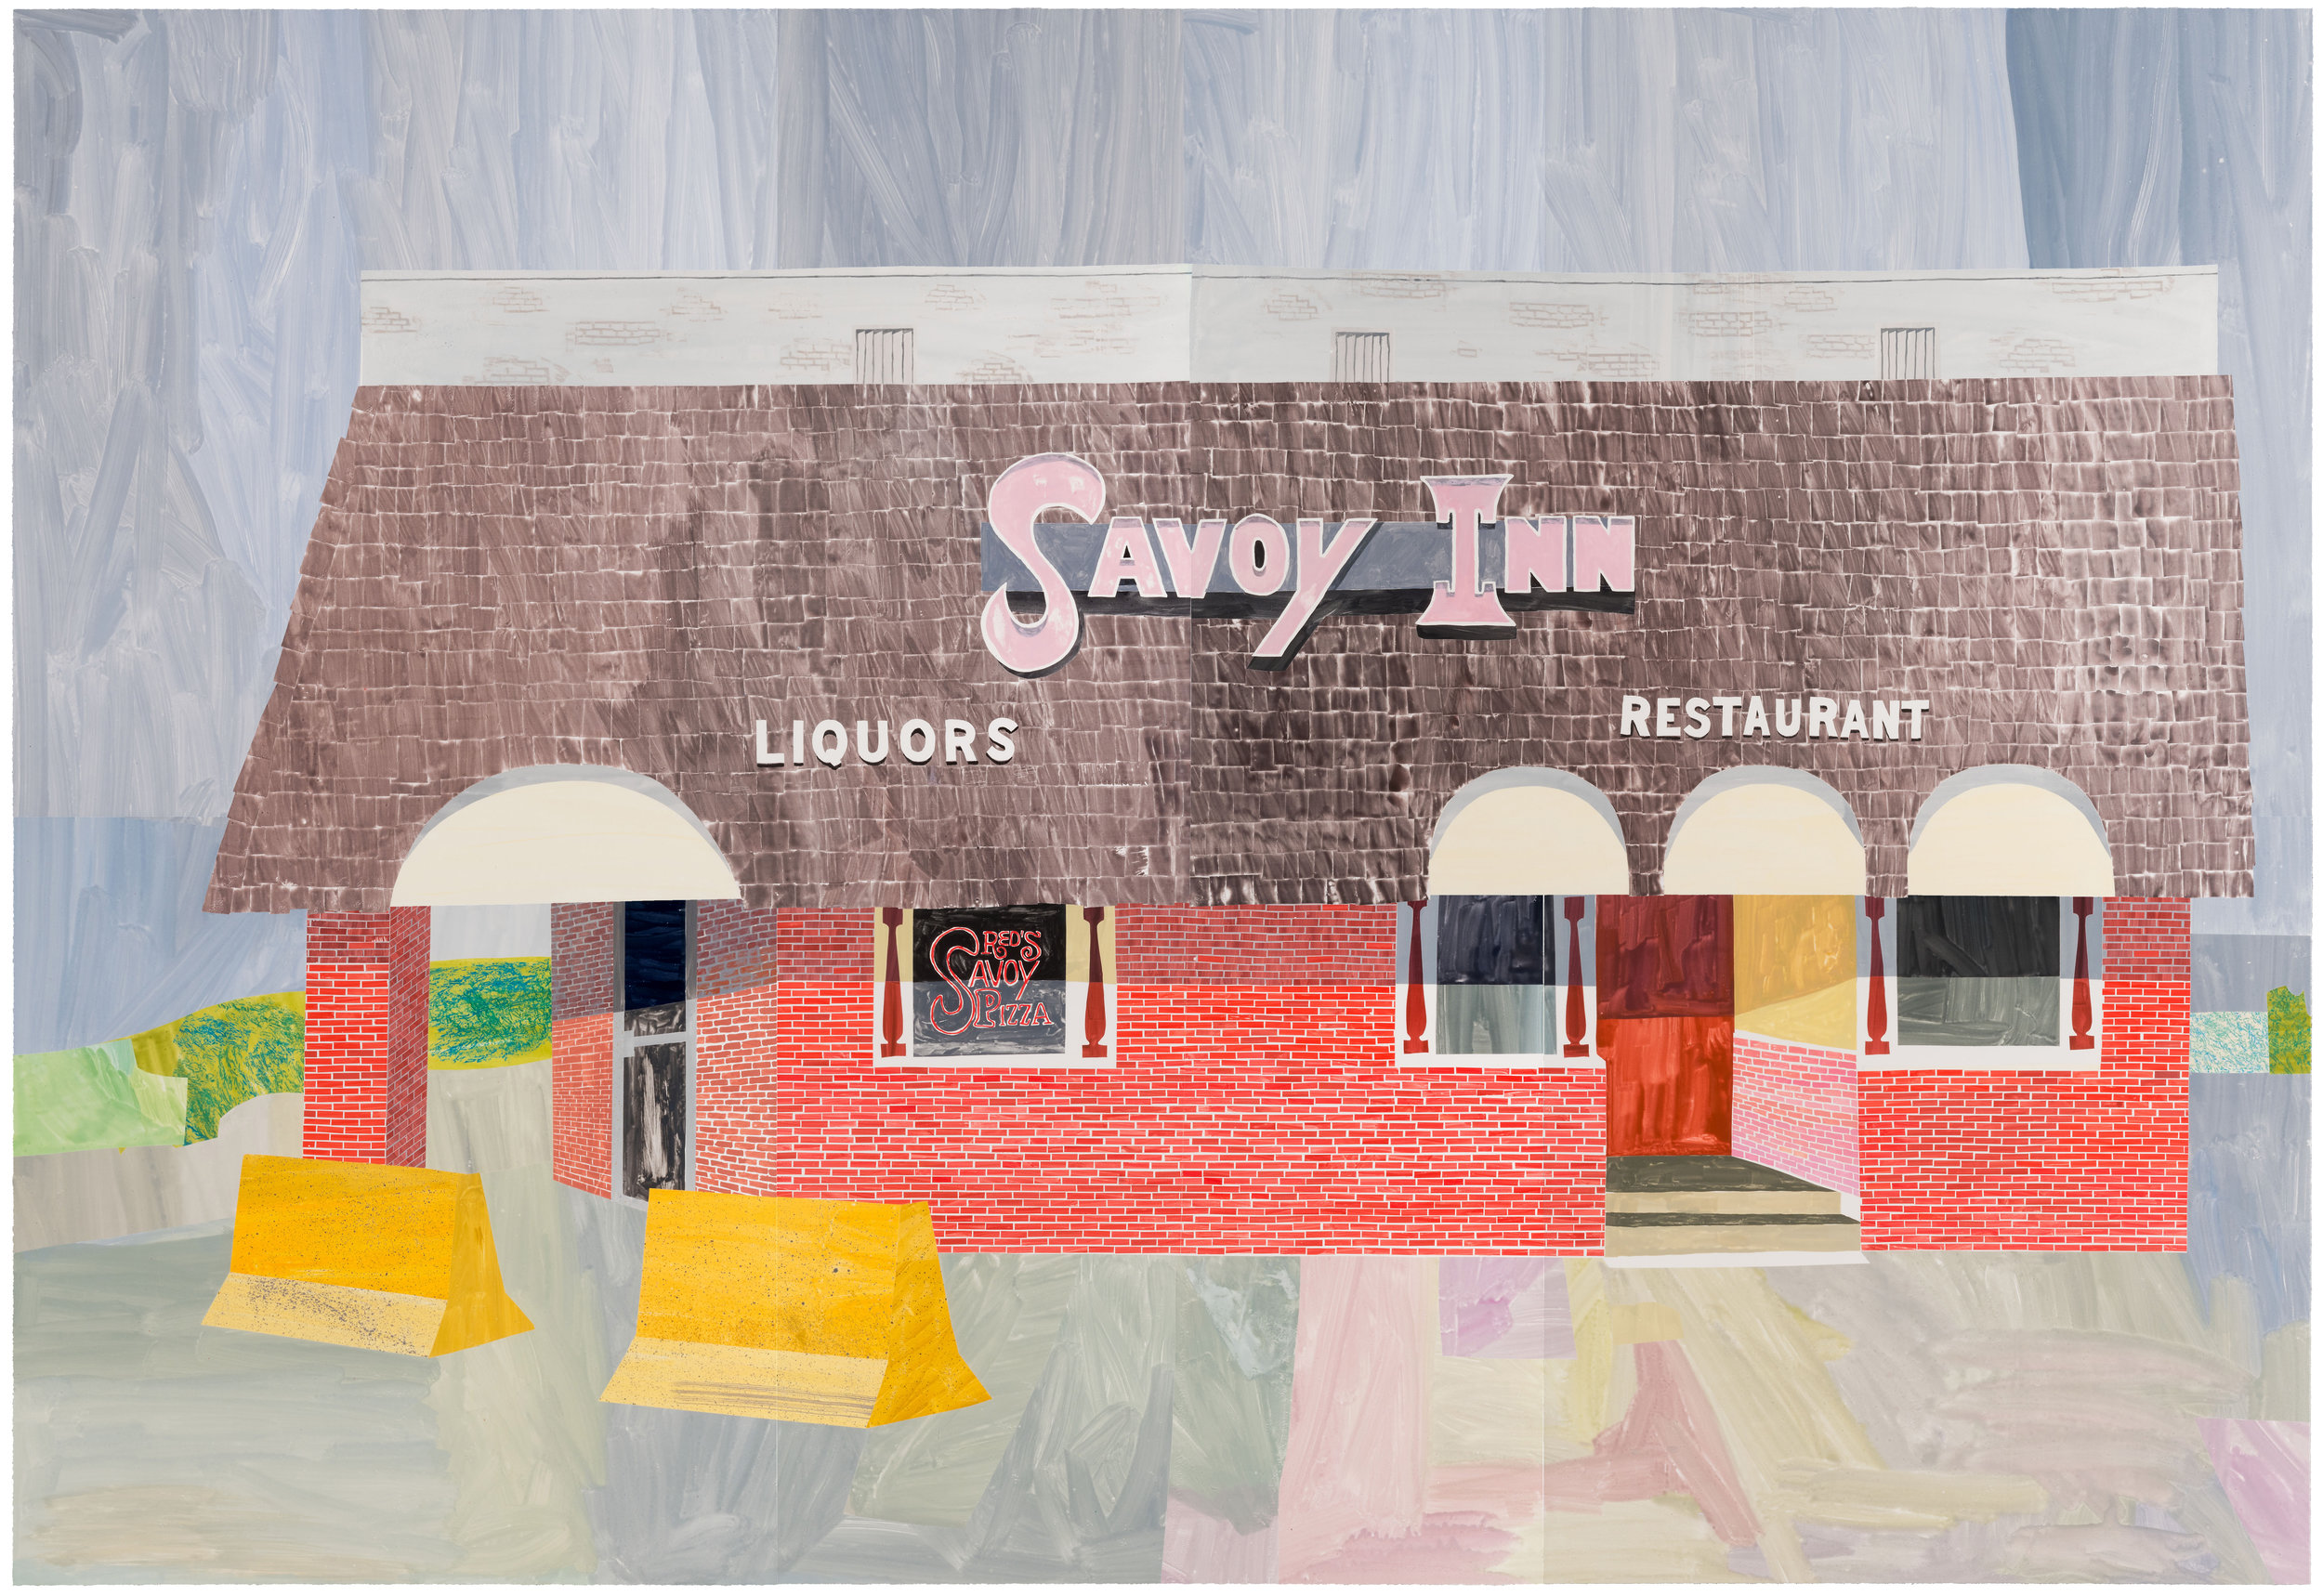 Savoy Inn, St. Paul by Carolyn Swiszcz Unique | Multi-panel monoprint with collage | 5' x 7' |